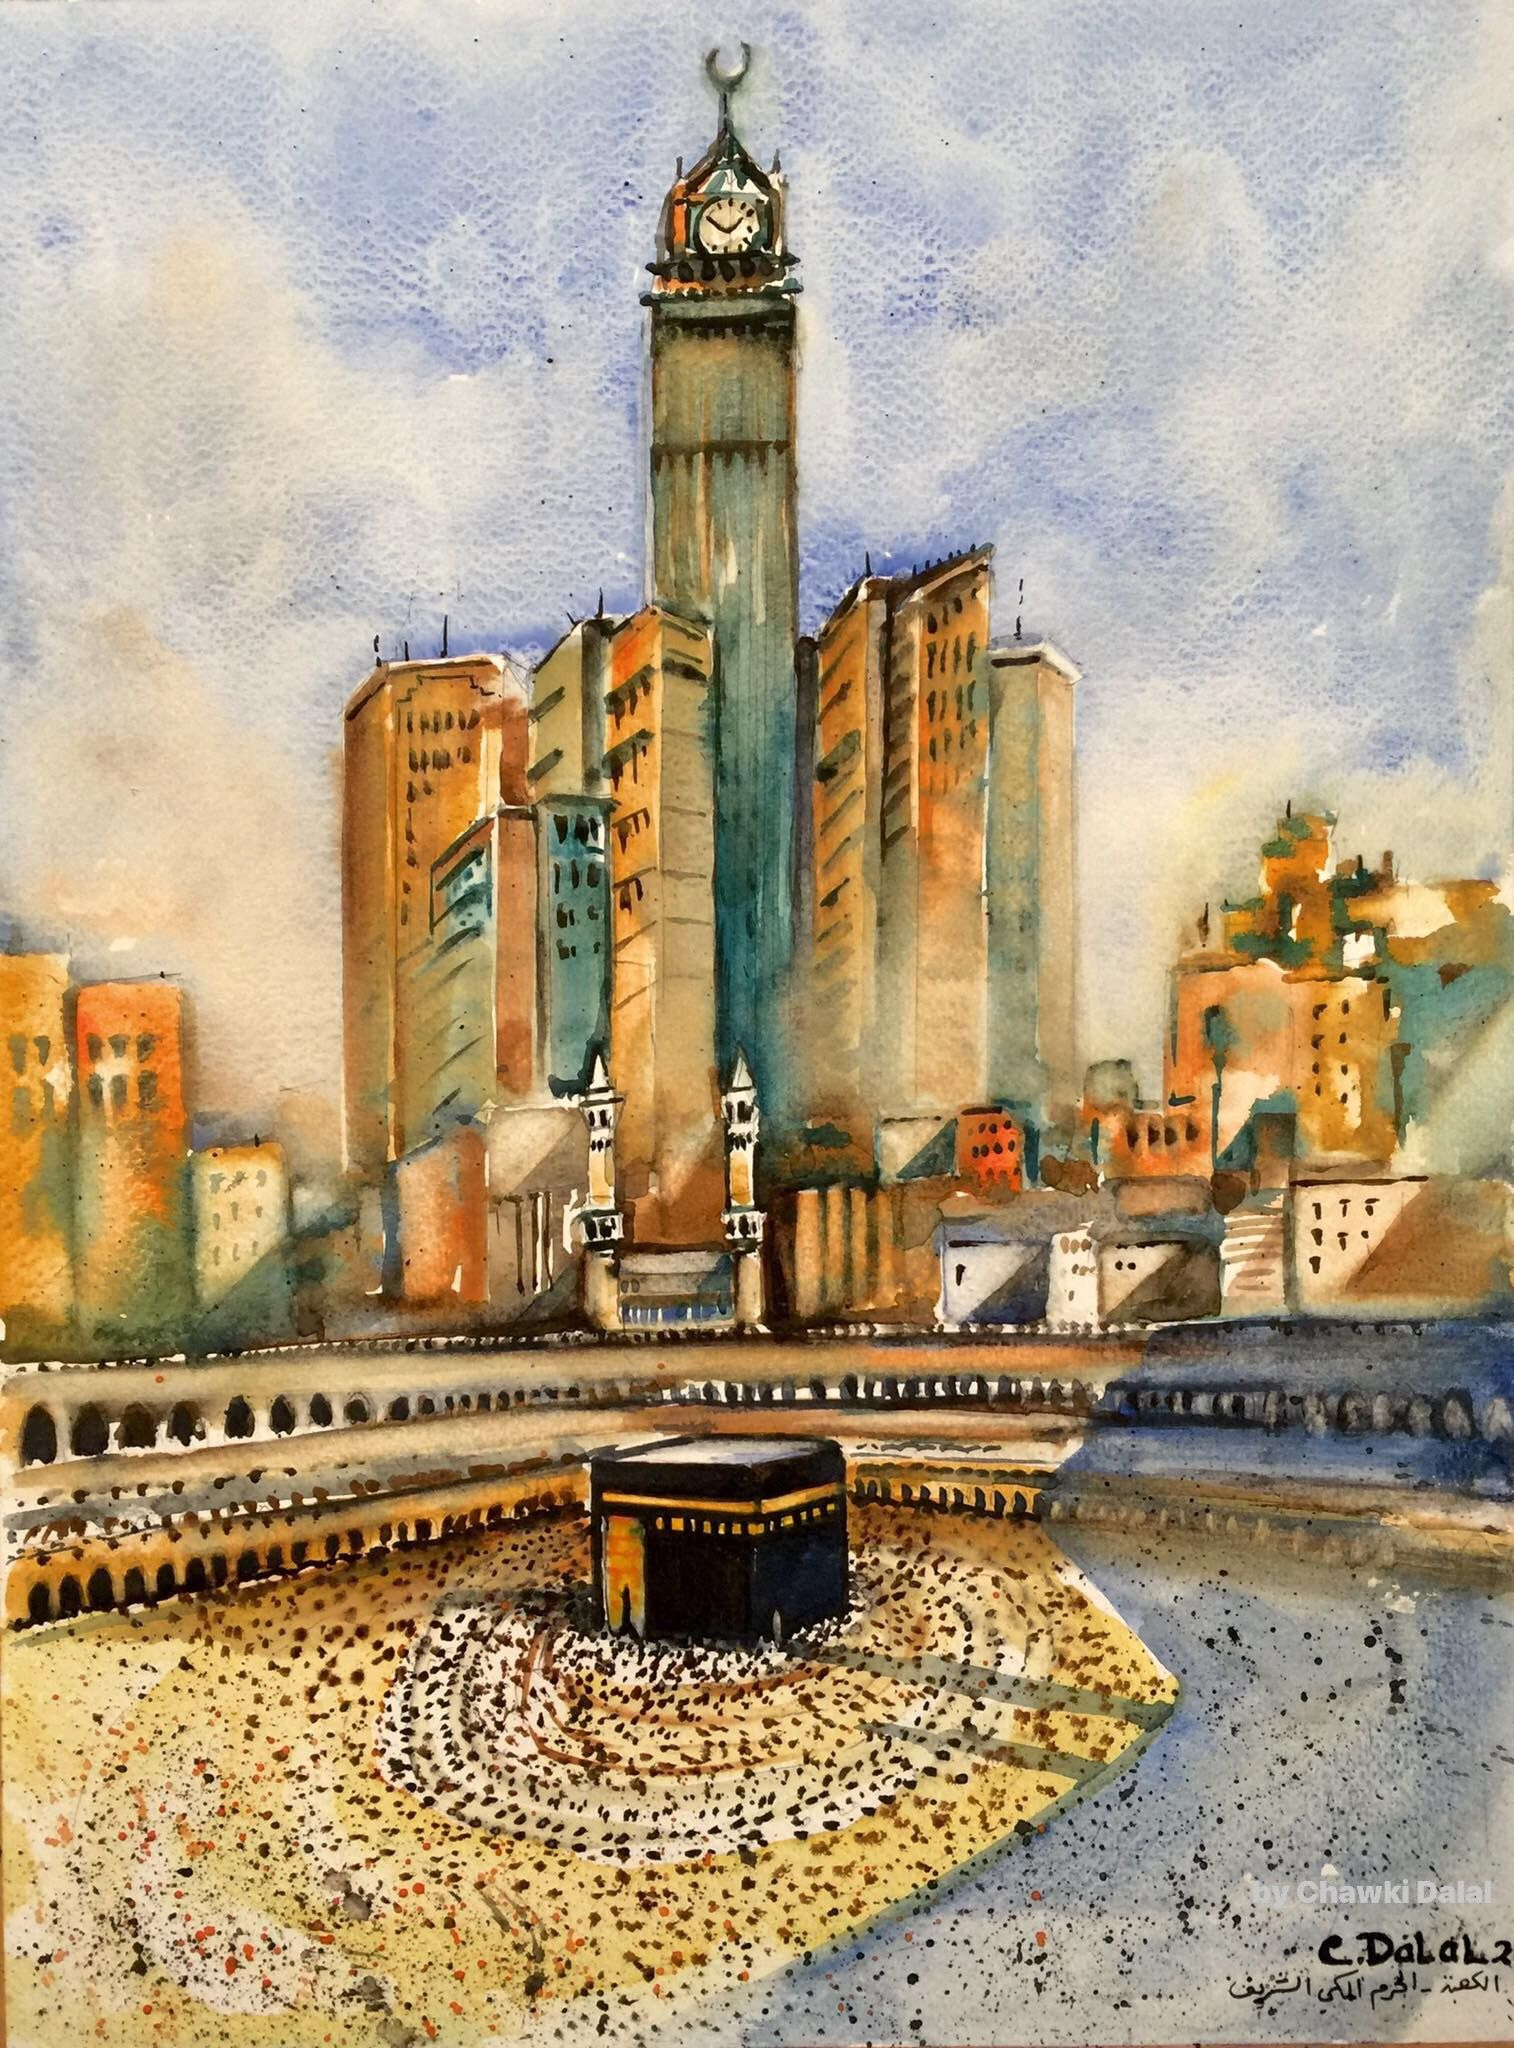 A New Watercolor By The Painter Chawki Dalal From Makkah Saudi Arabia لوحة مائية بريشتي للح ر م الم ك ي الشريف في م ك ة المكرمة المملكة العربي Art Painting